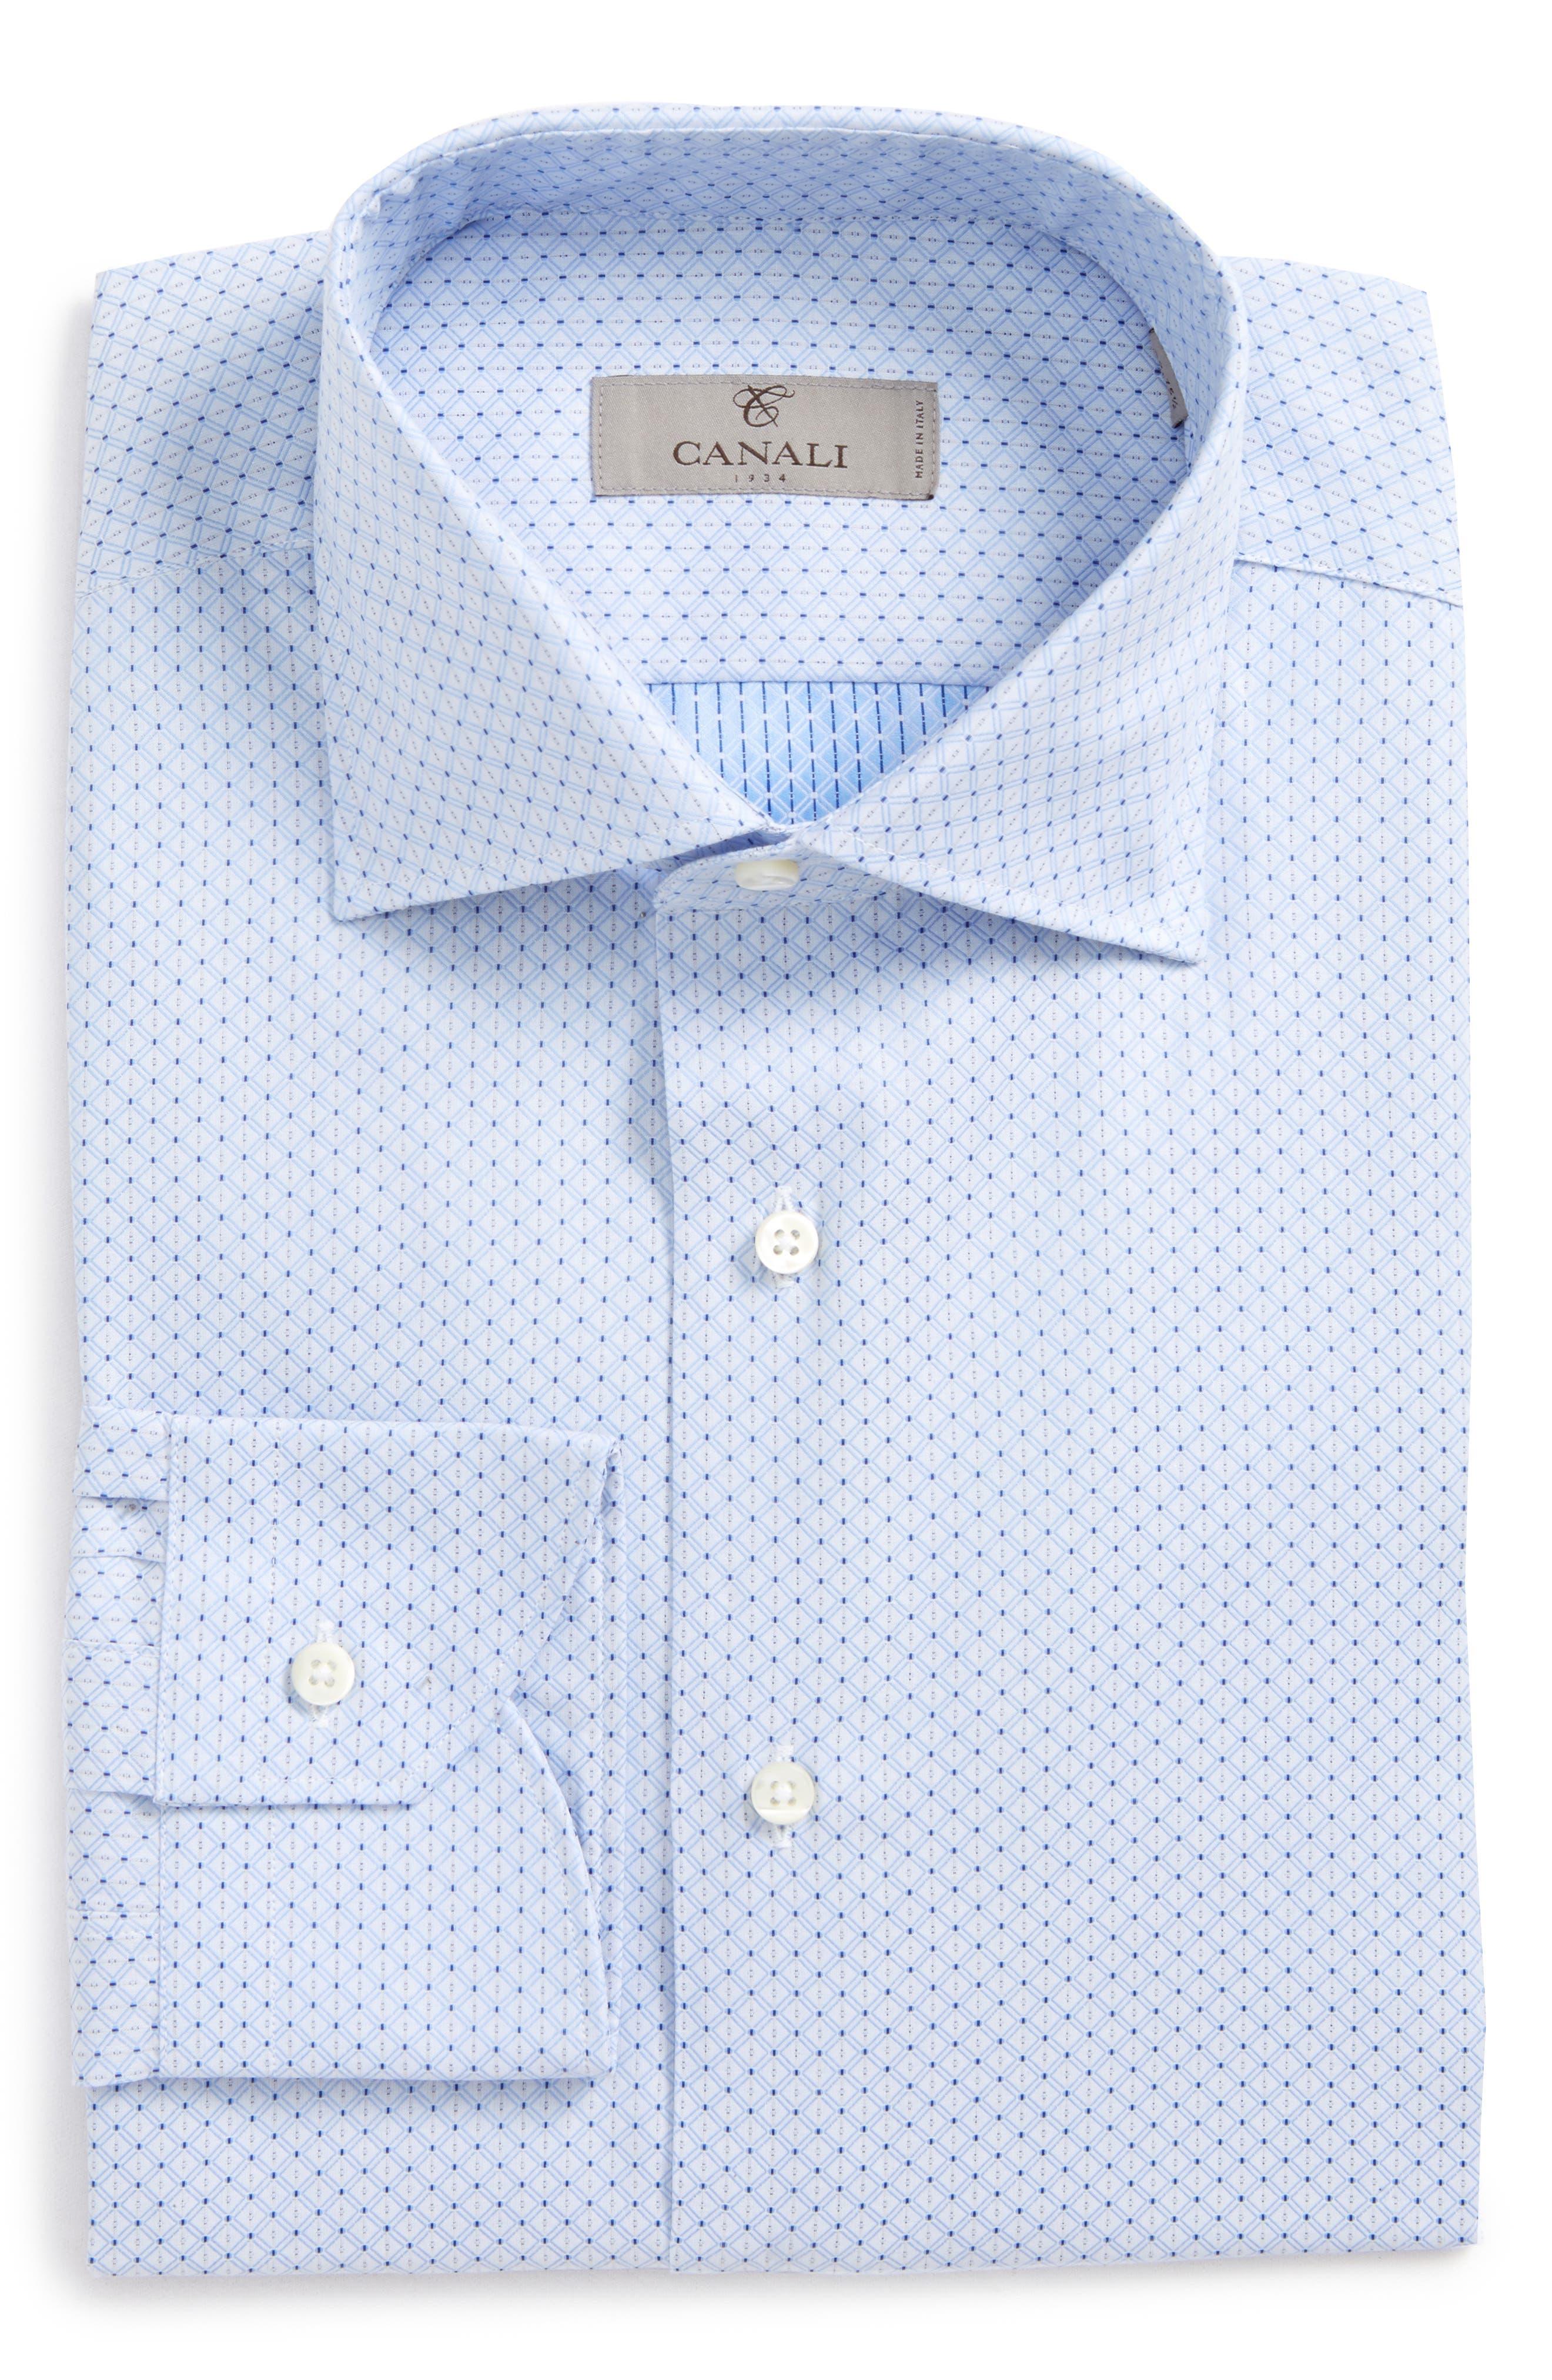 Main Image - Canali Regular Fit Geometric Dress Shirt